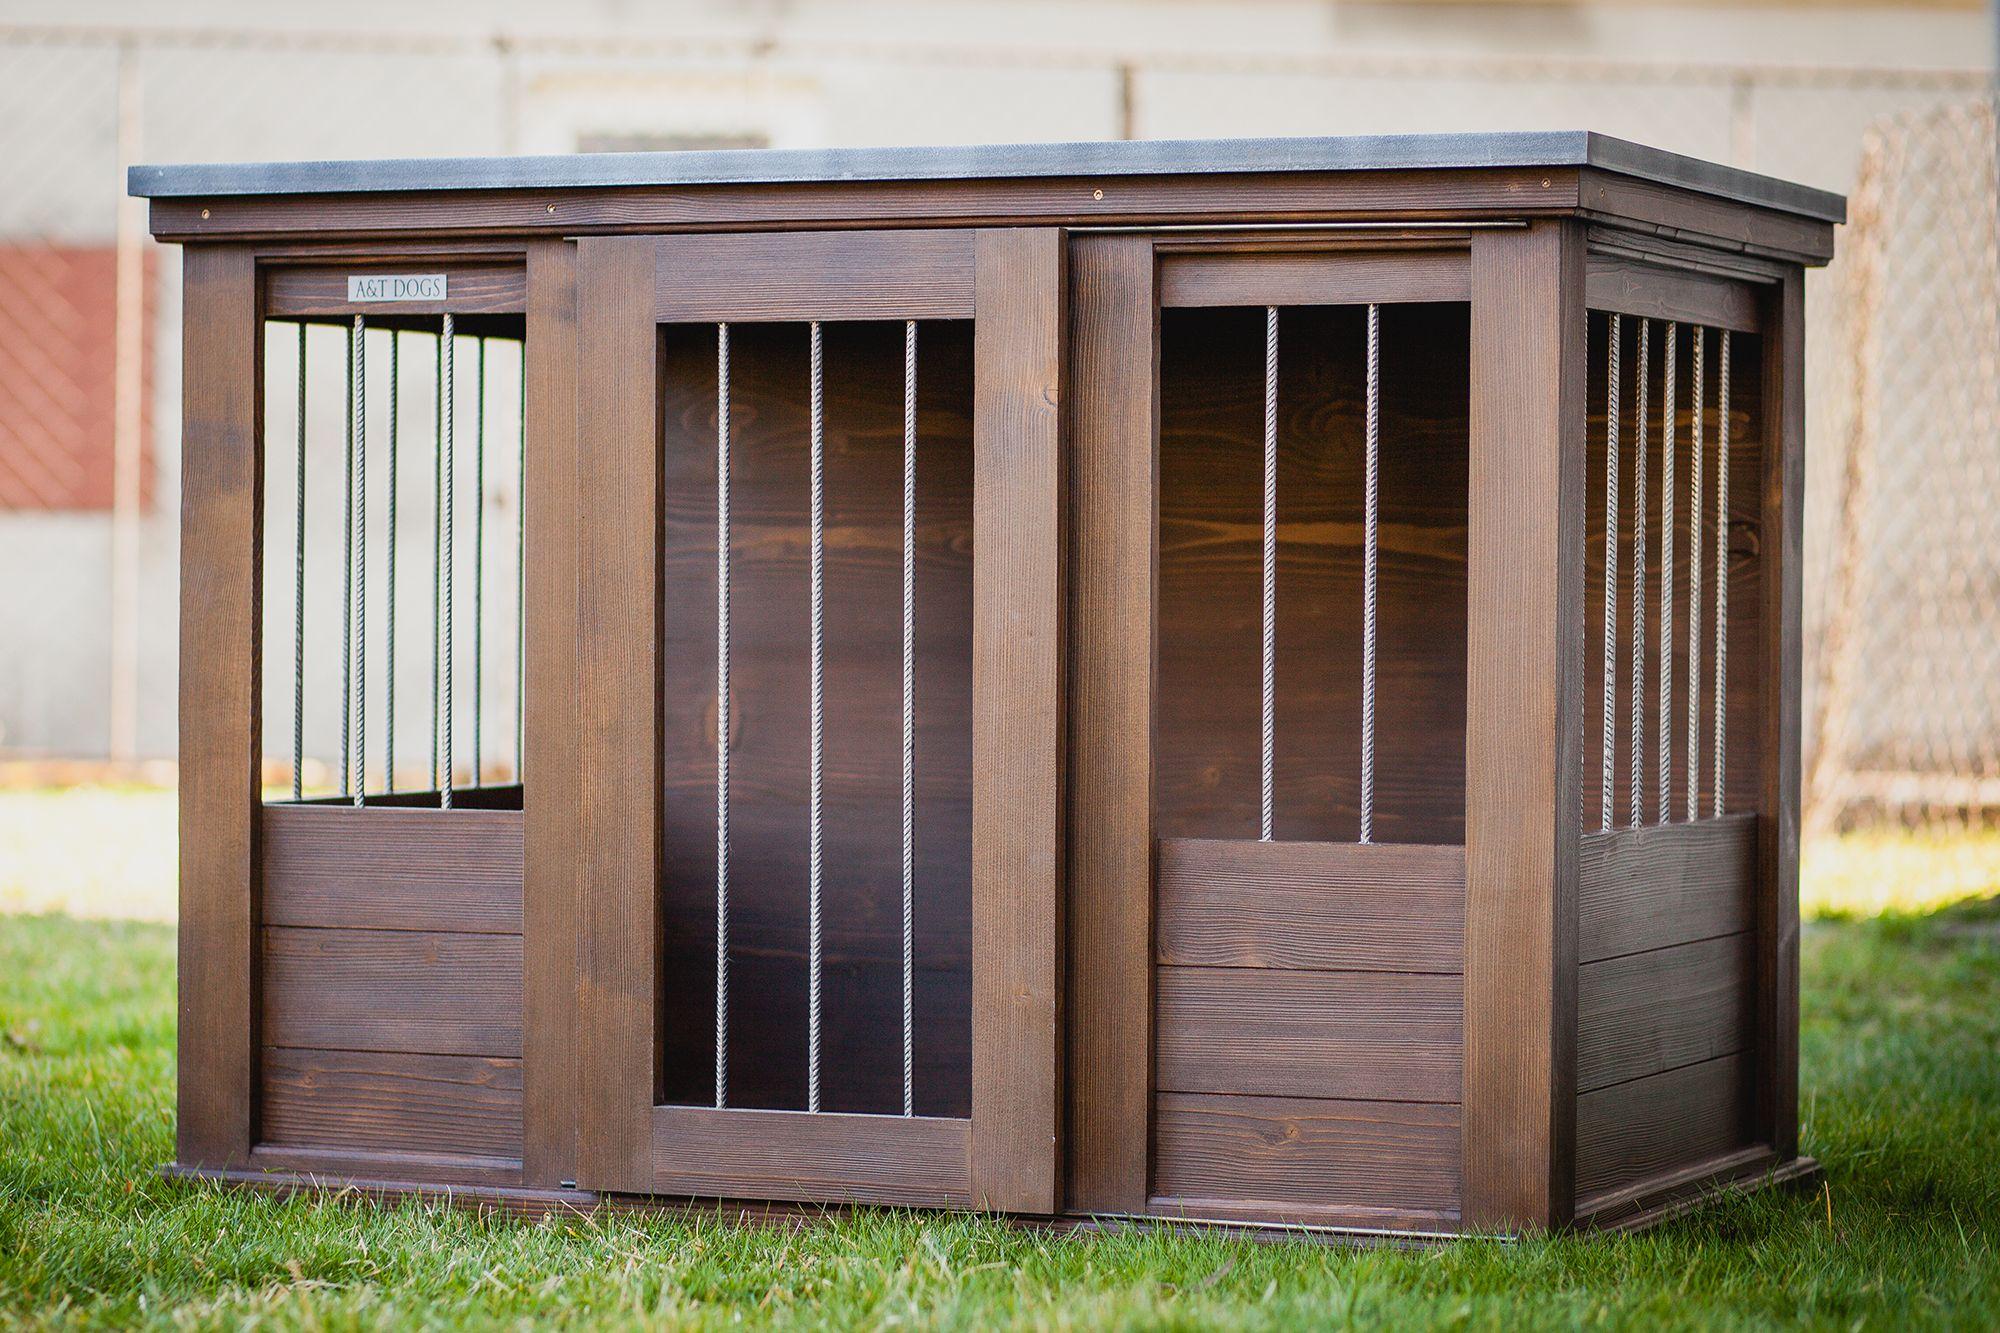 Mebel Klatka Dla Psa Duza Home Diy Tall Cabinet Storage House Design